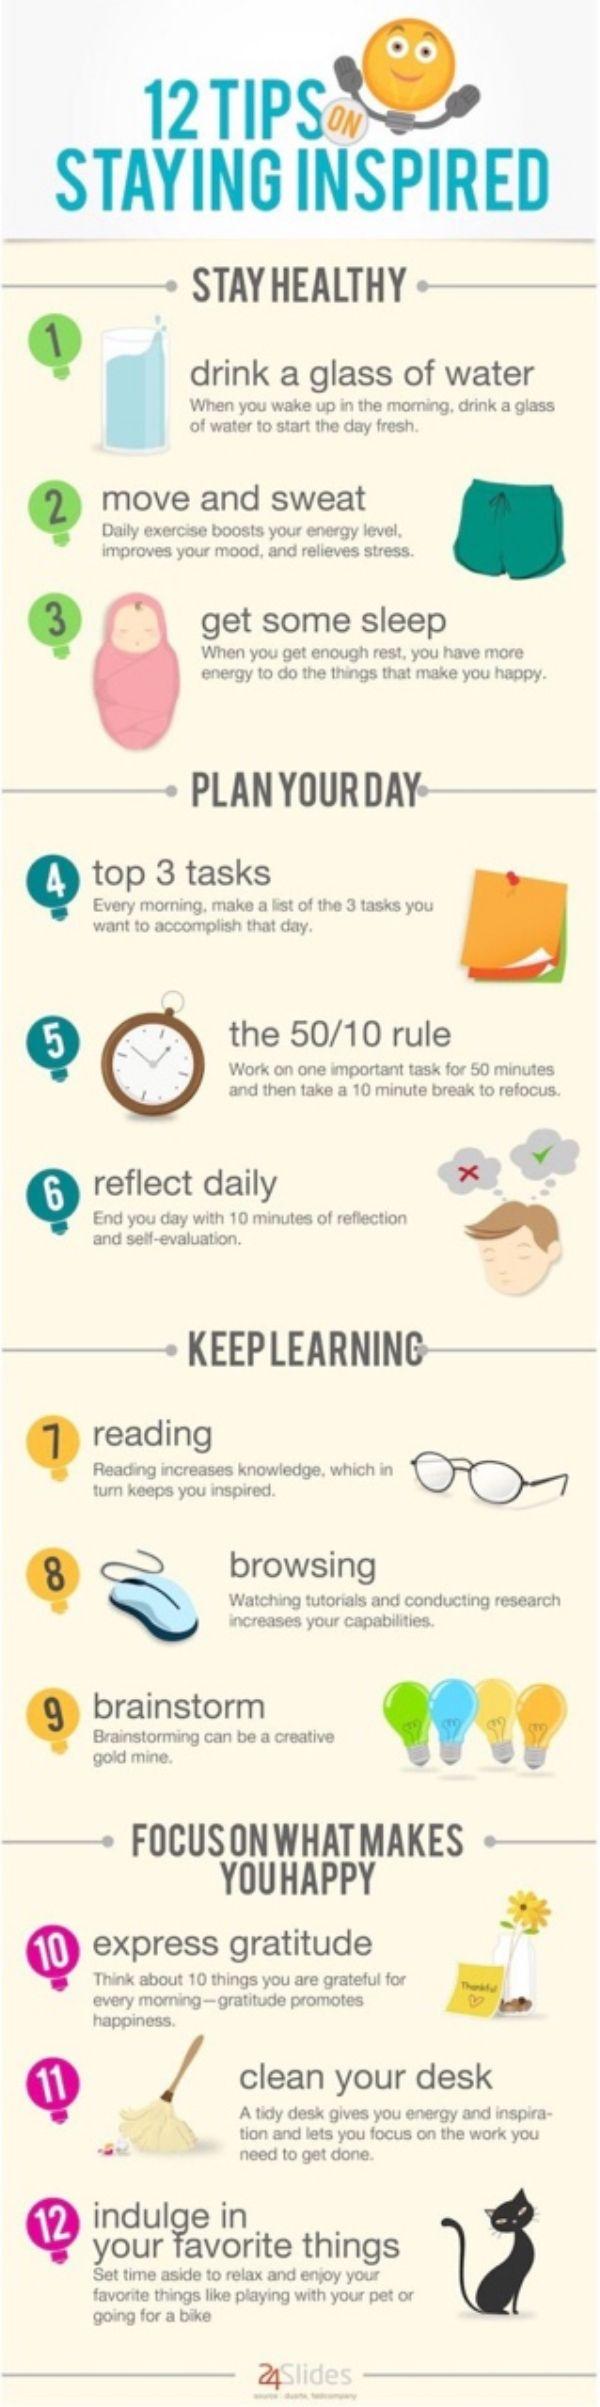 daily-motivation-16